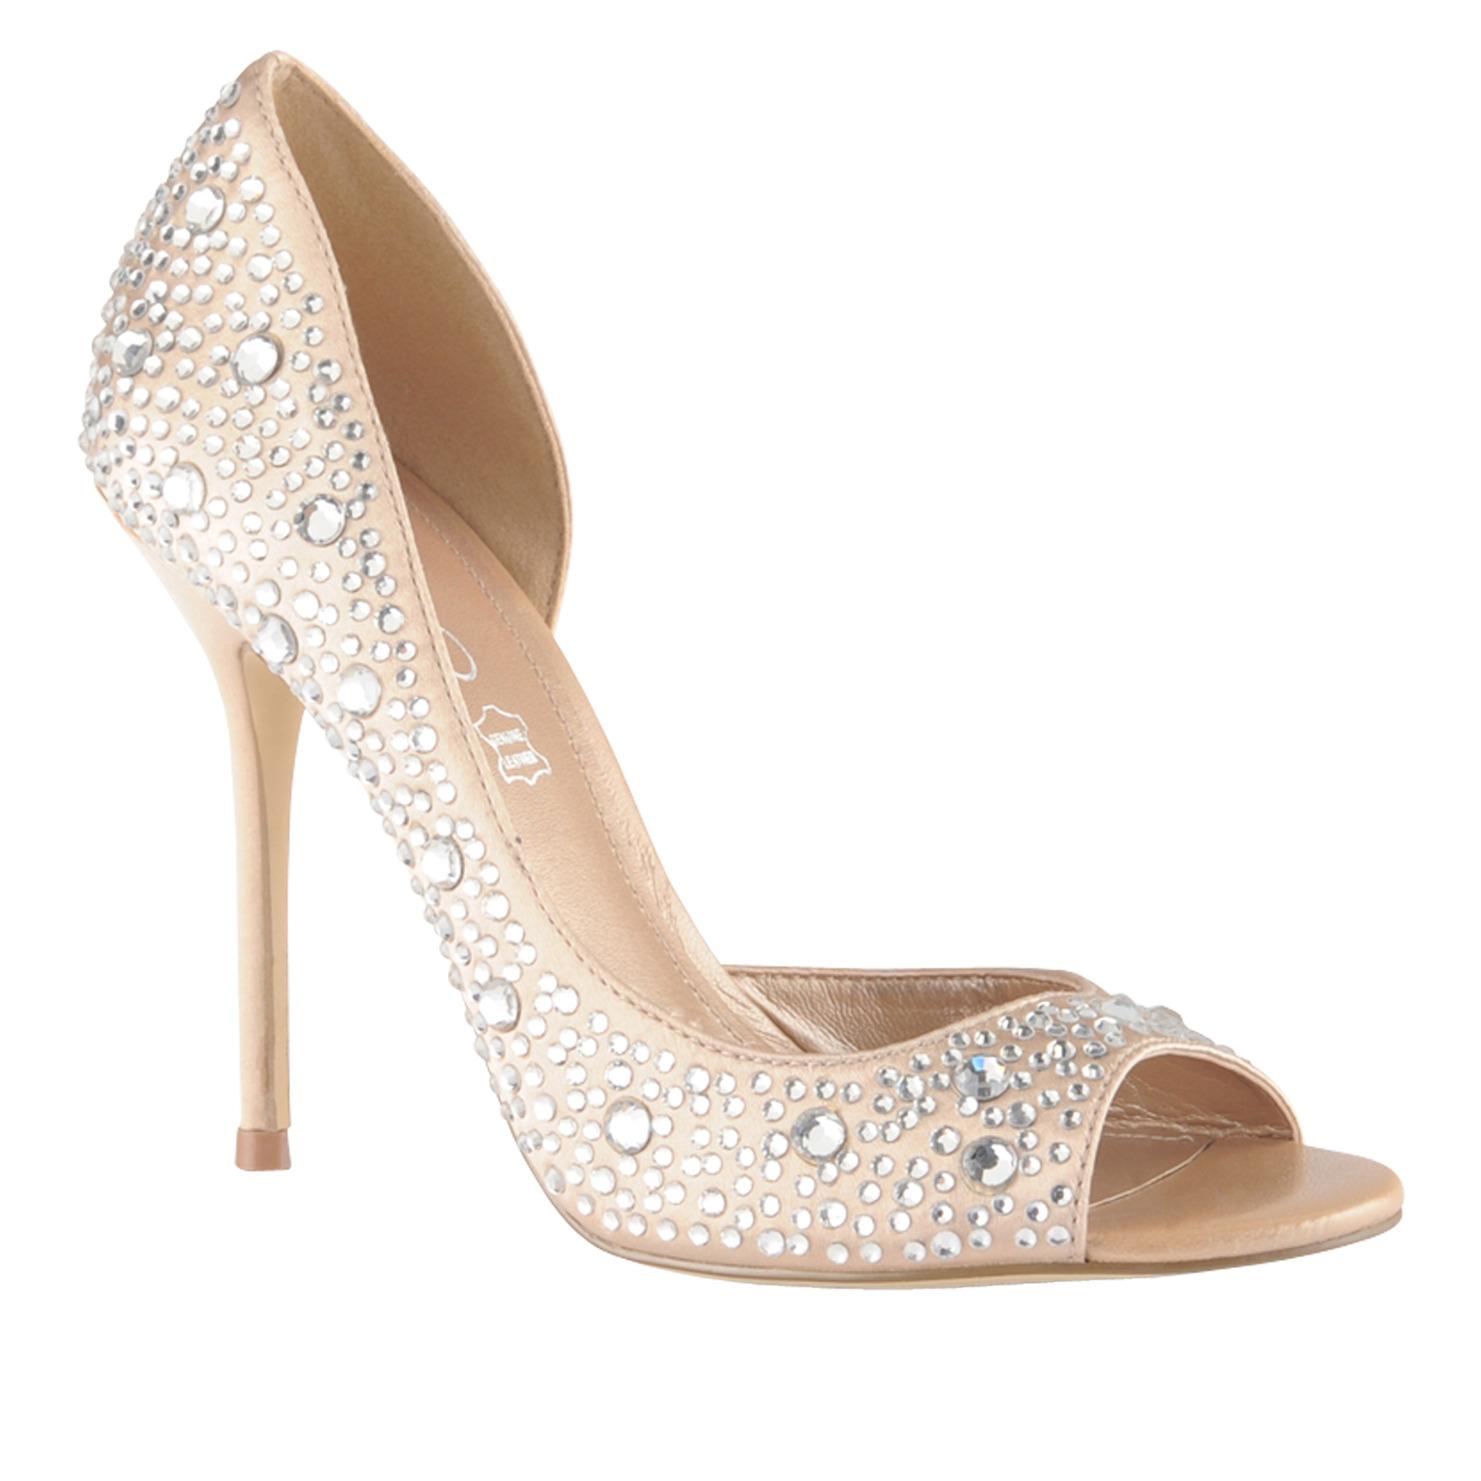 Bridal Shoes Aldo: A Pretty Pair To Brighten Up Your Day...Aldo